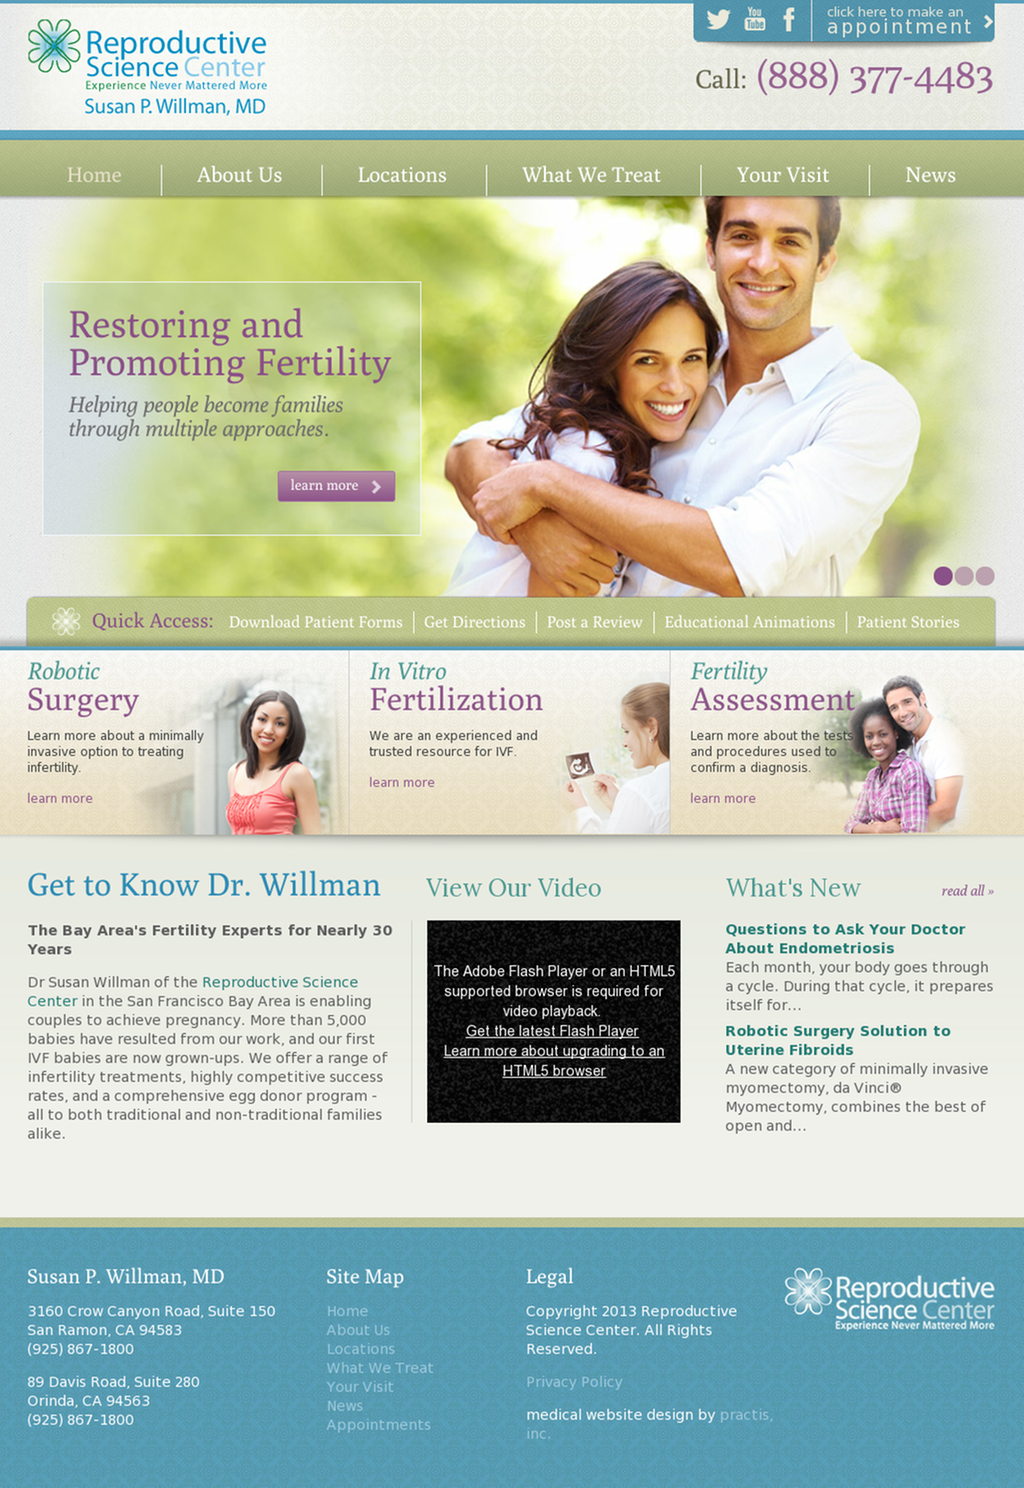 Pin By Sosoclumsy On Web Design Health Wellness Medical Websites Website Design Web Design